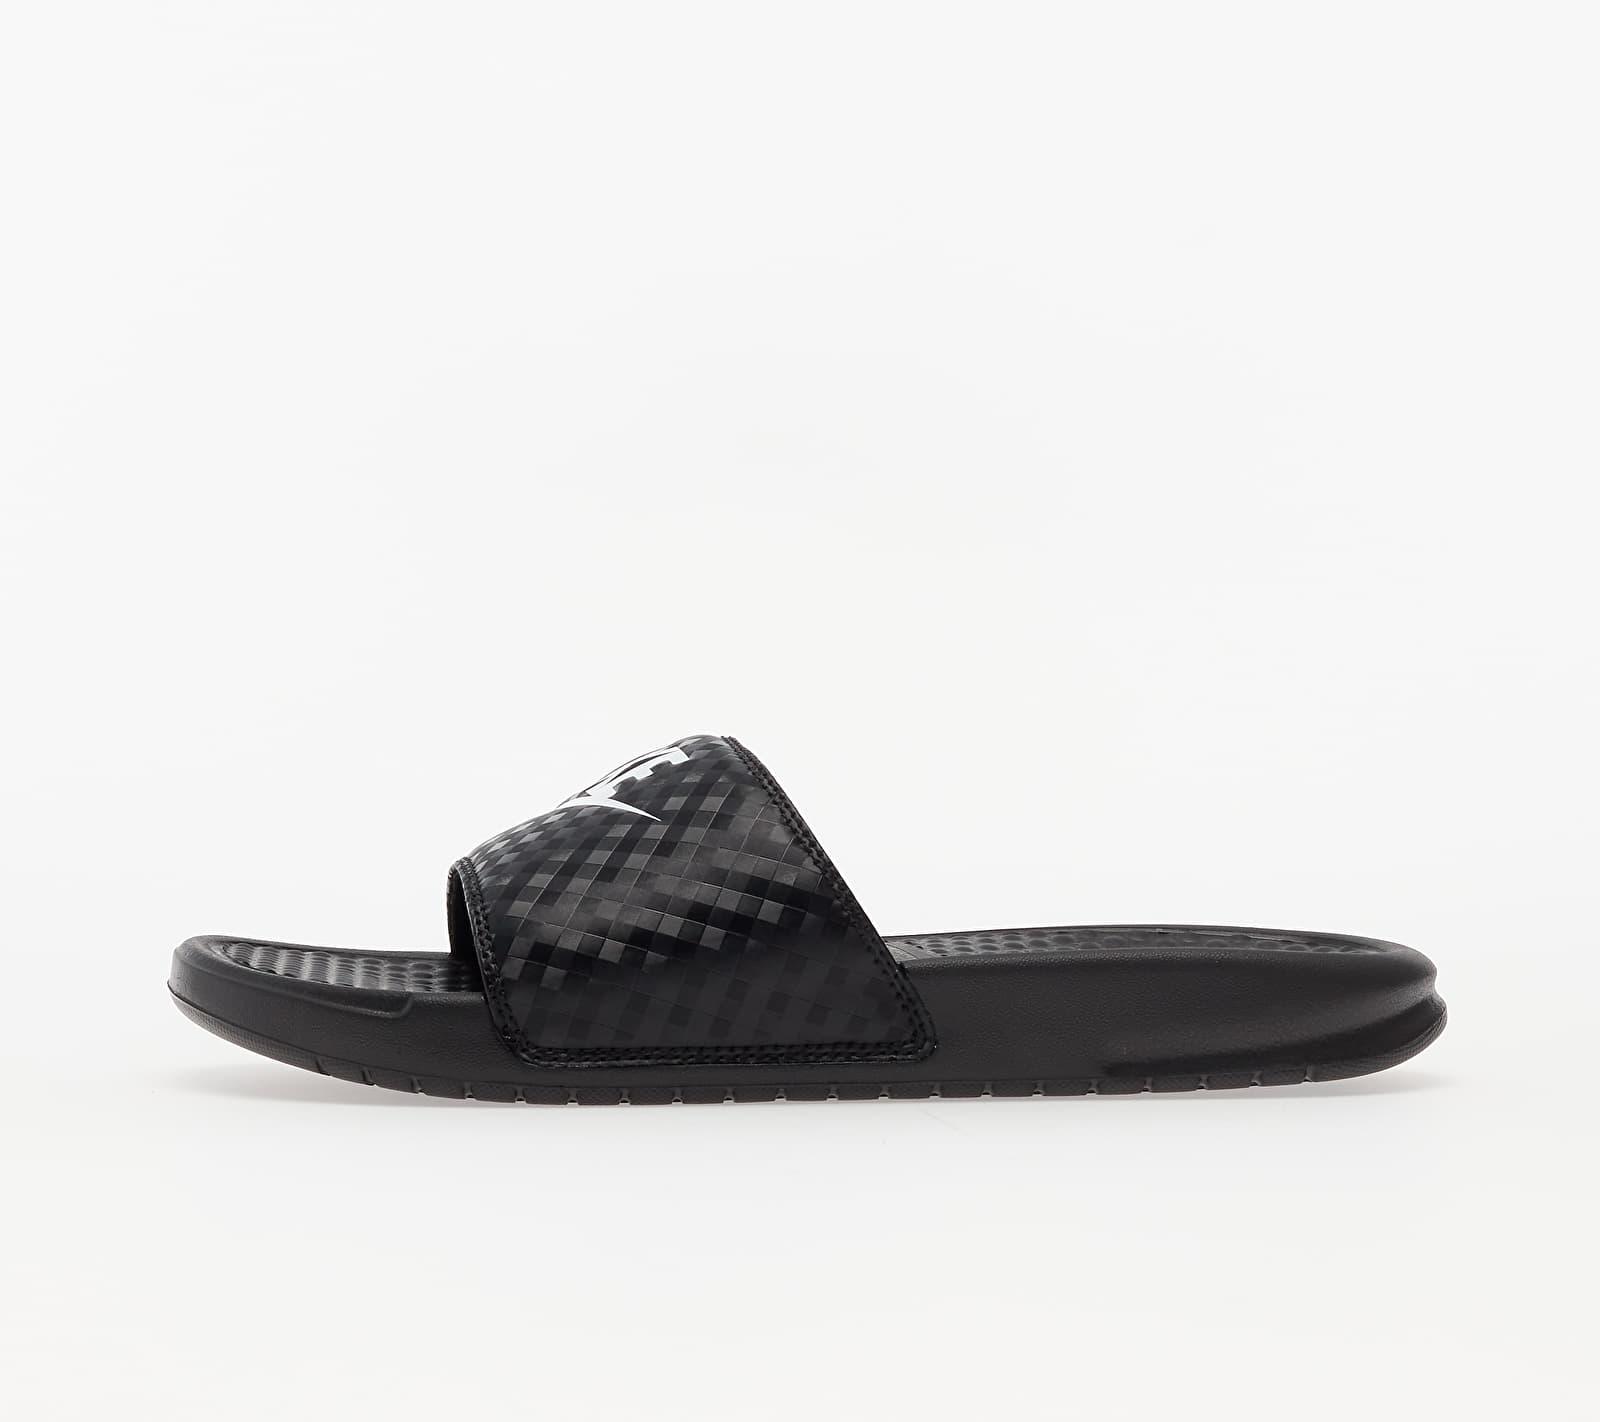 Nike Wmns Benassi Jdi Black/ White EUR 36.5